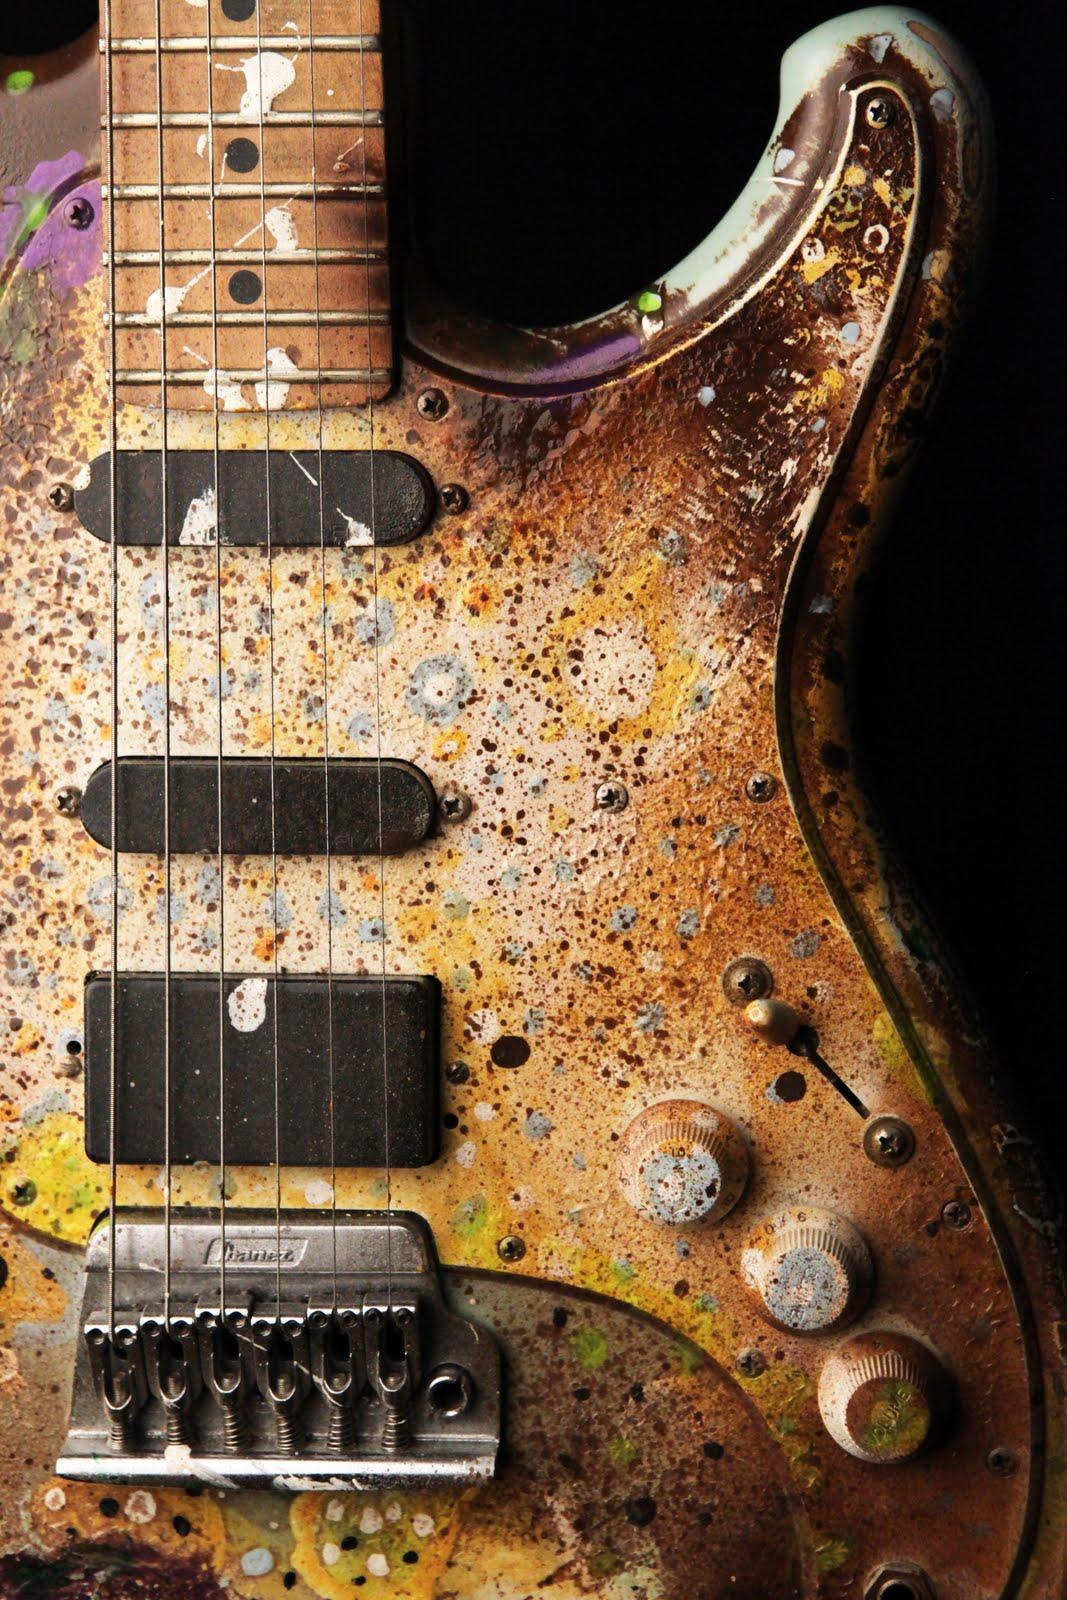 barnyard-guitars.jpg